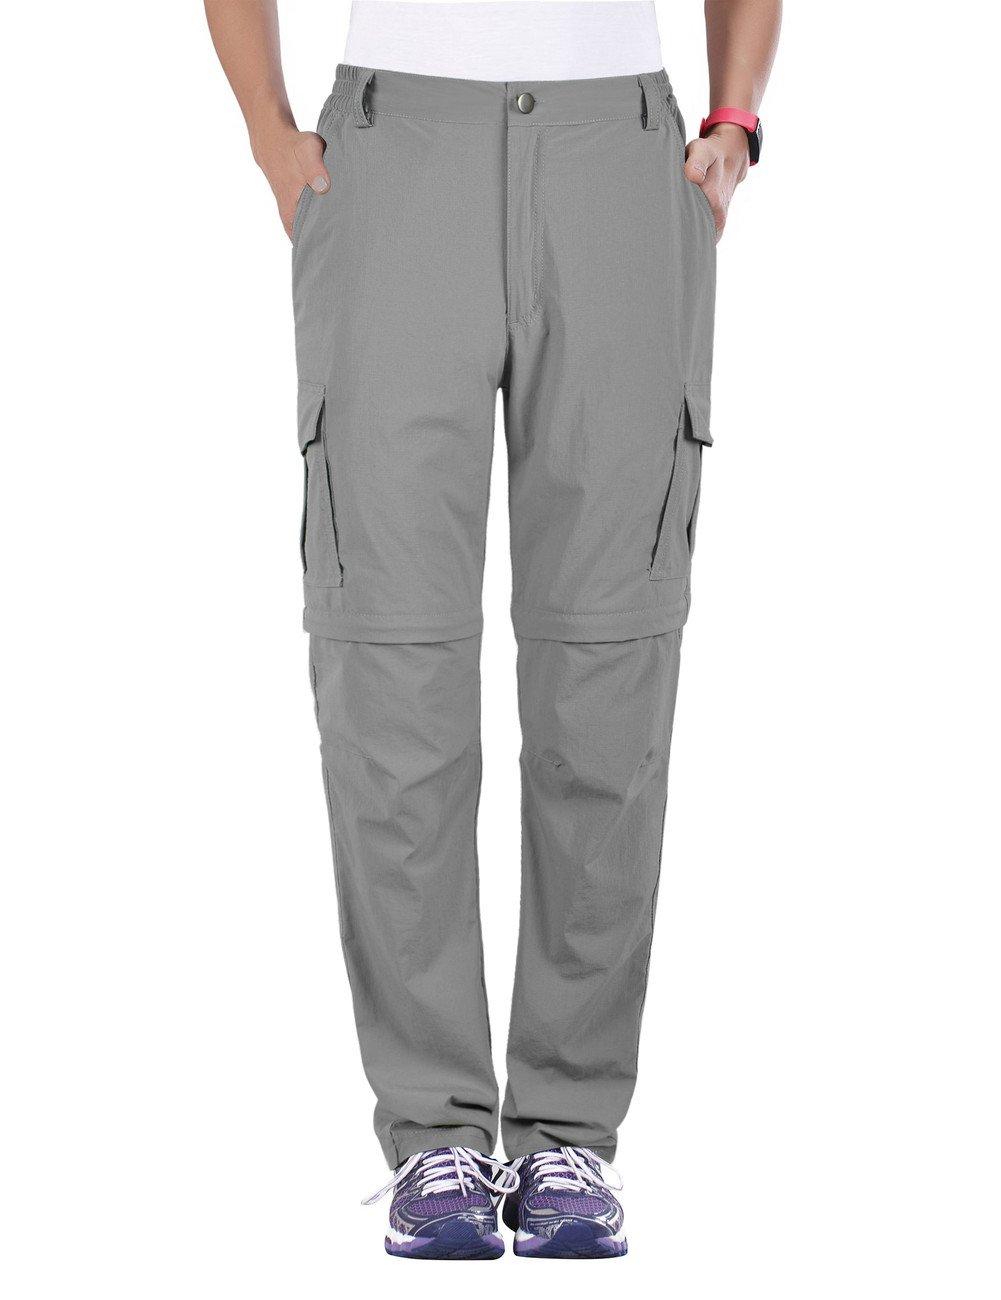 Unitop Women's Water Resistant Cargo Trousers Pants Light Gray XL